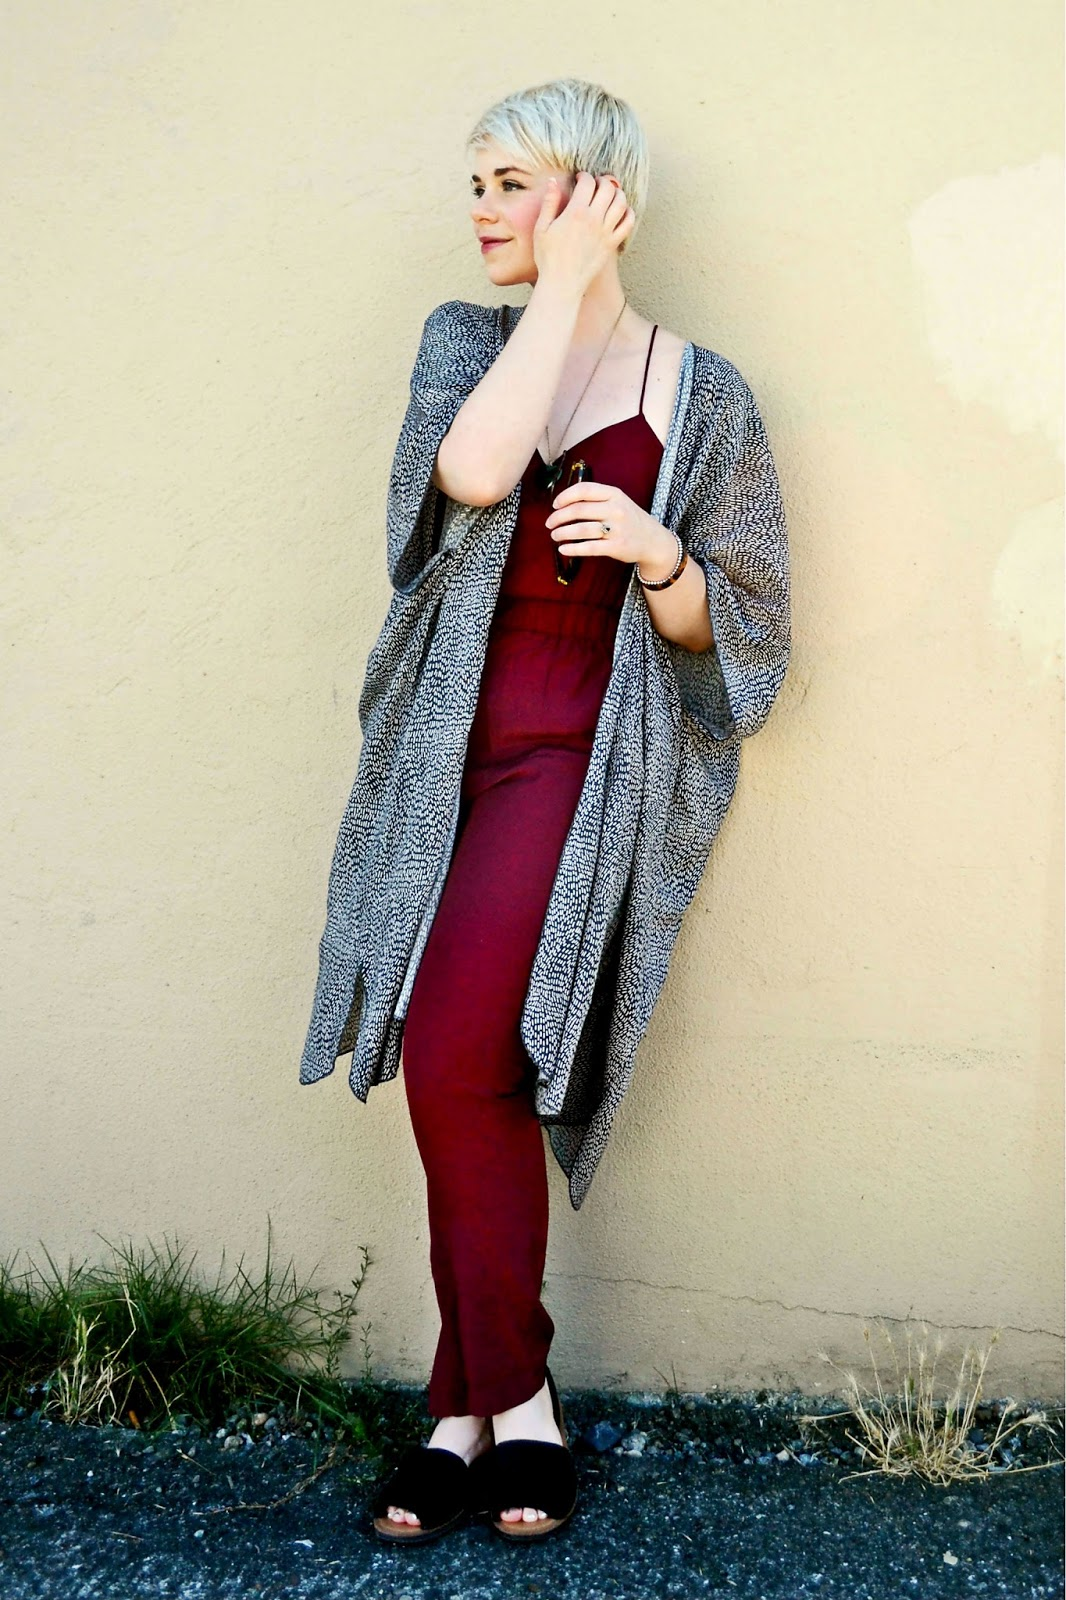 jewel tones, fall fashion, kimono, outfit ideas, look of the day, fleur d'elise,